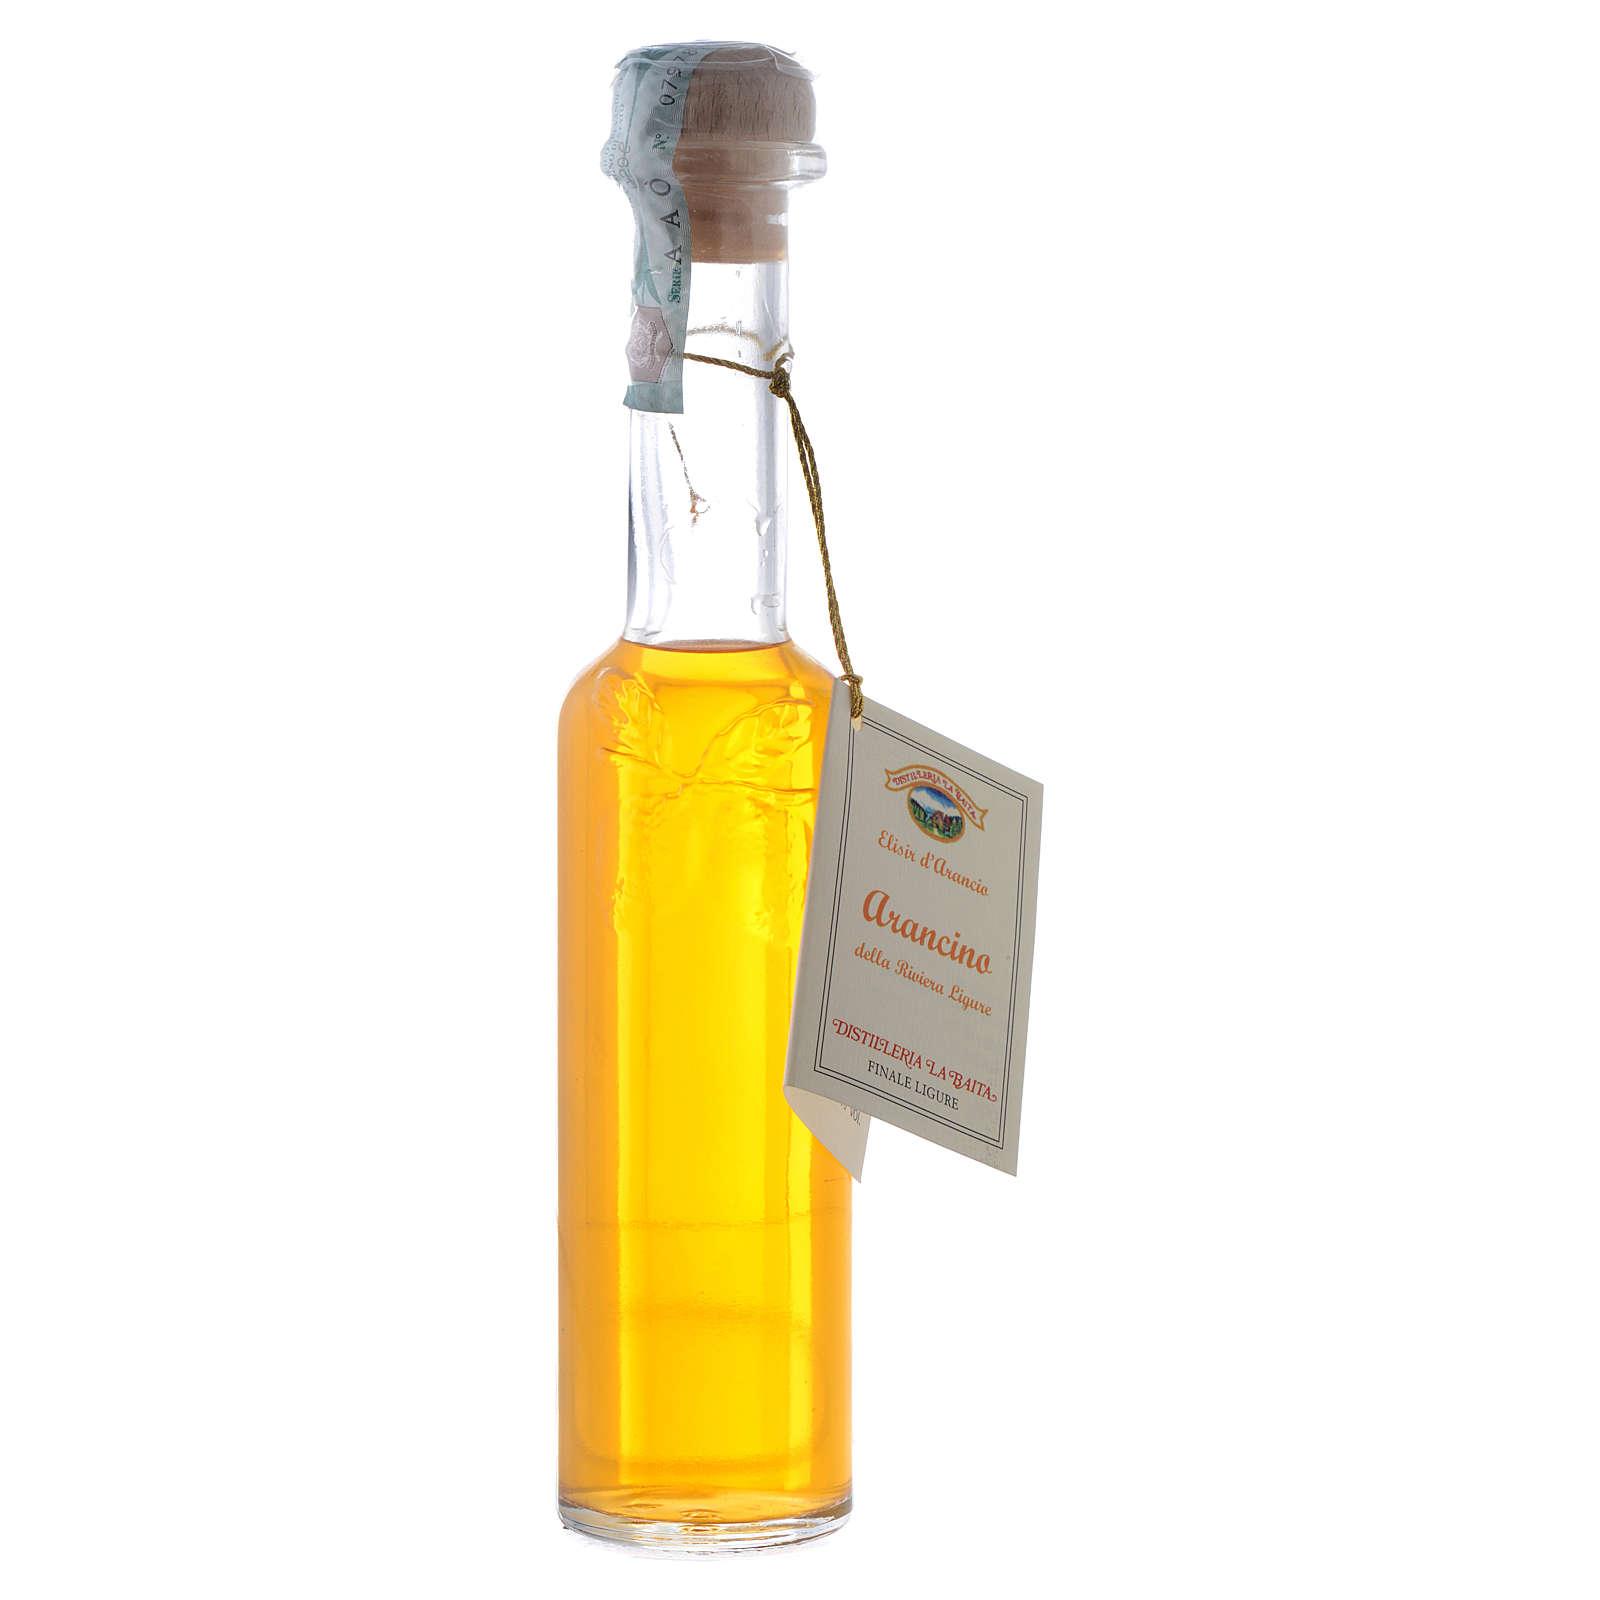 Elixir de naranja Arancino 3